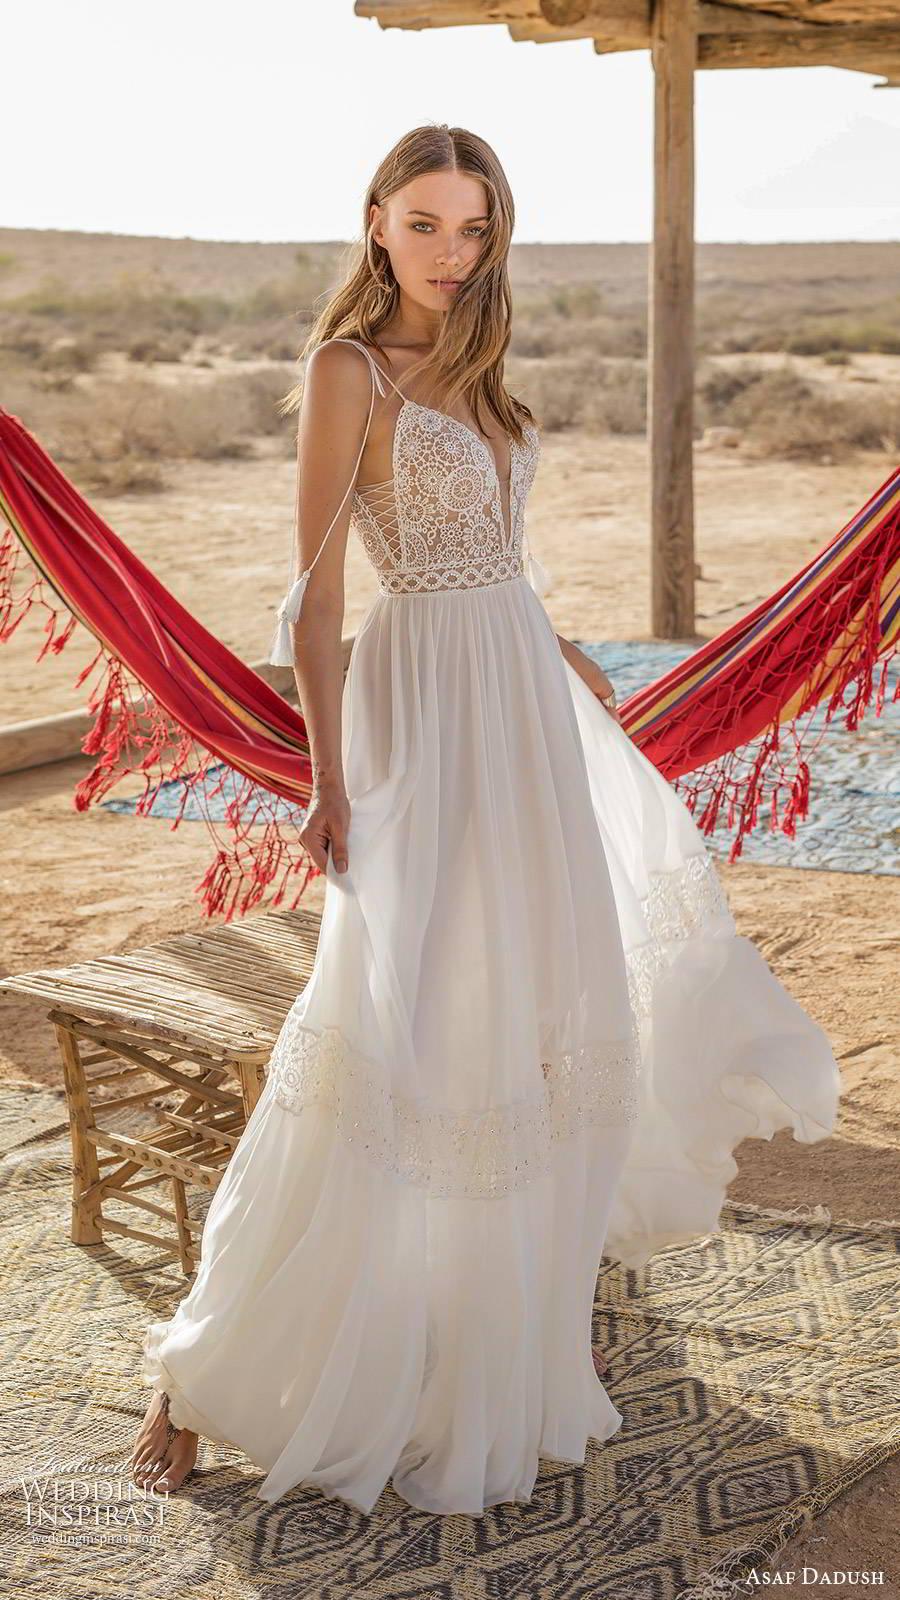 asaf dadush 2019 bridal sleeveless thin straps plunging v neckline embellished bodice romantic boho a line wedding dress low back sweep train (8) sv